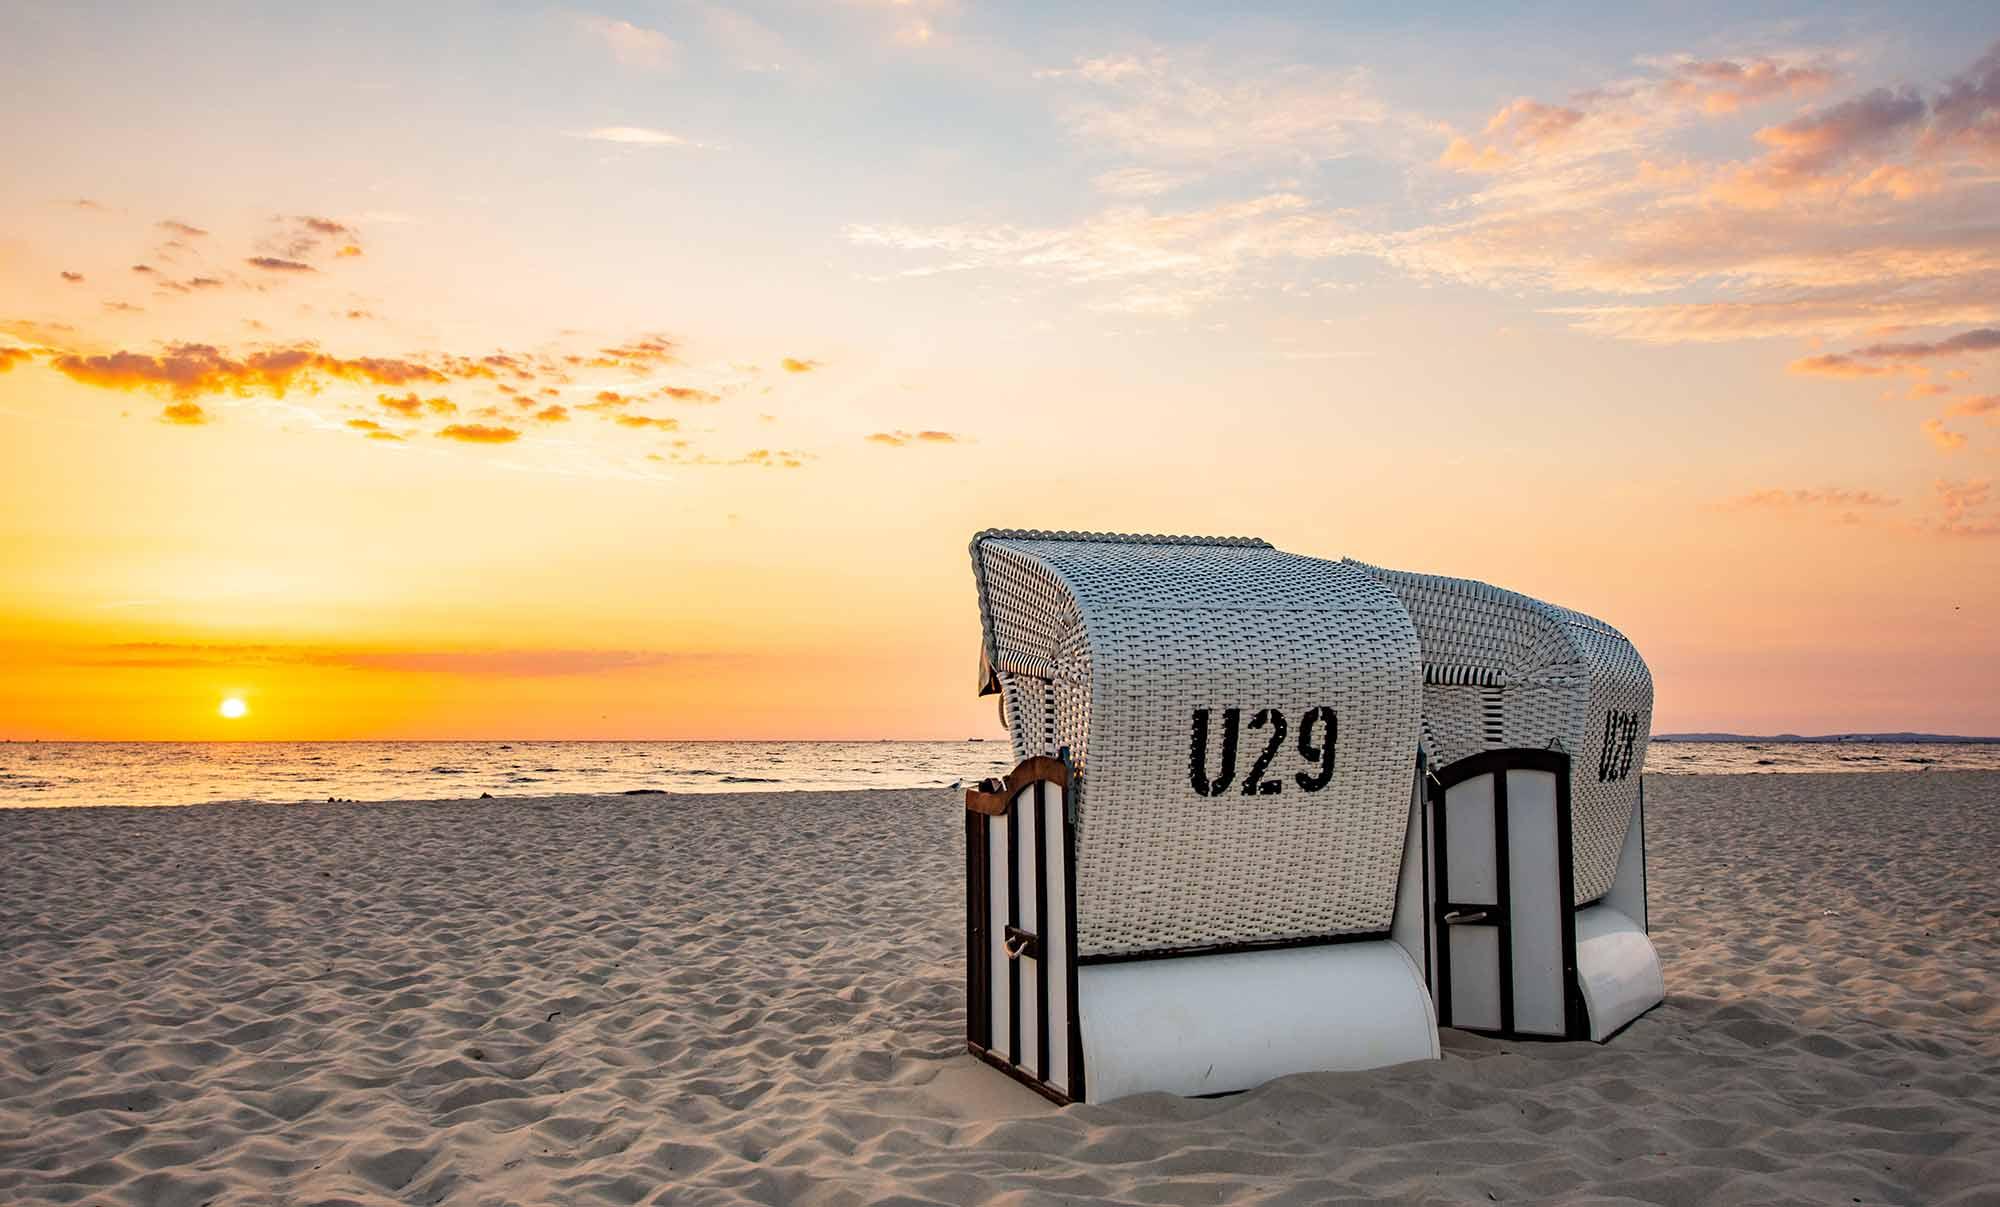 Strandkorb am Strand Sonnenaufgang